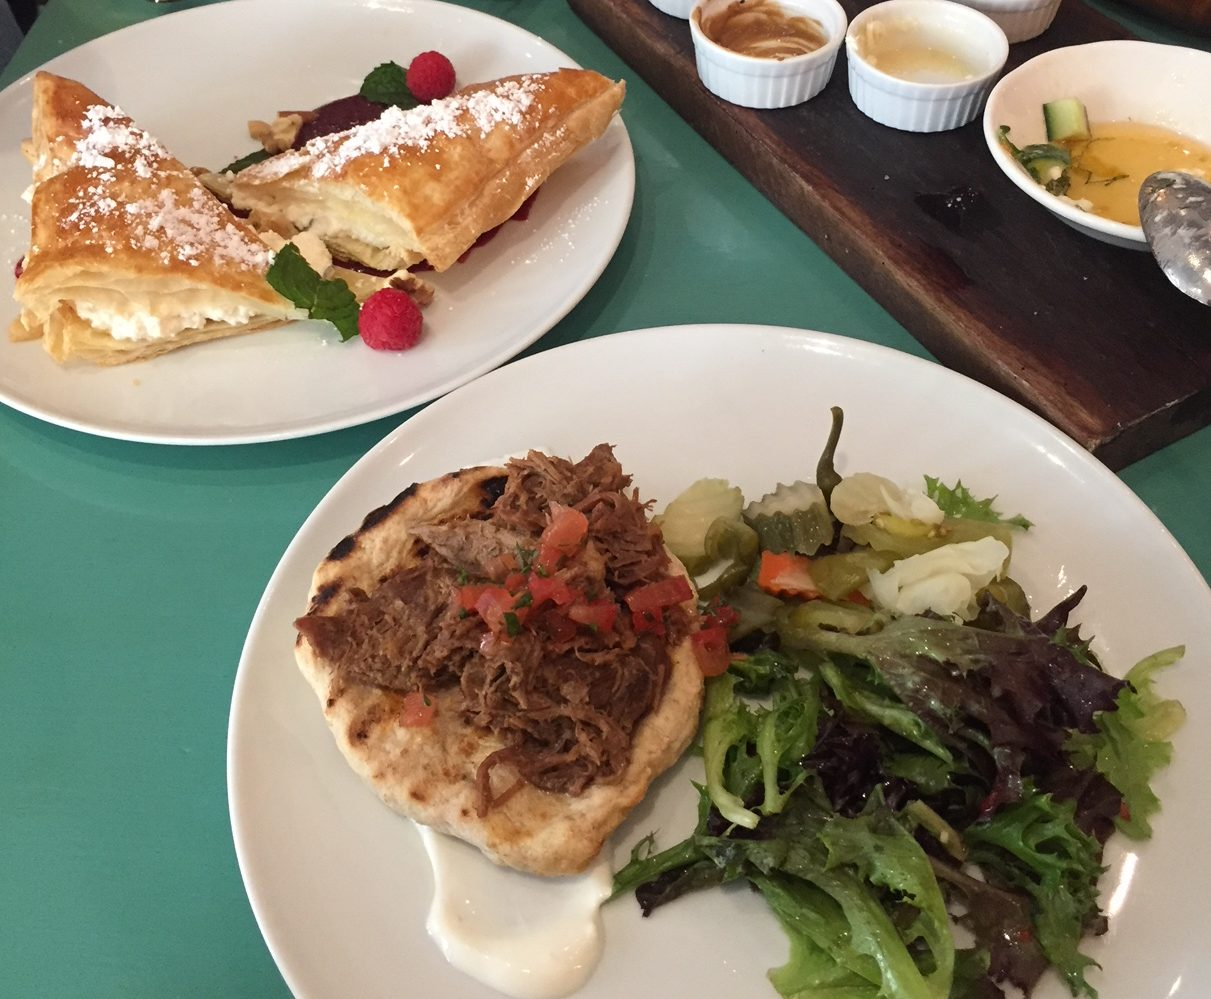 brunch montreal - option turque au restaurant Su